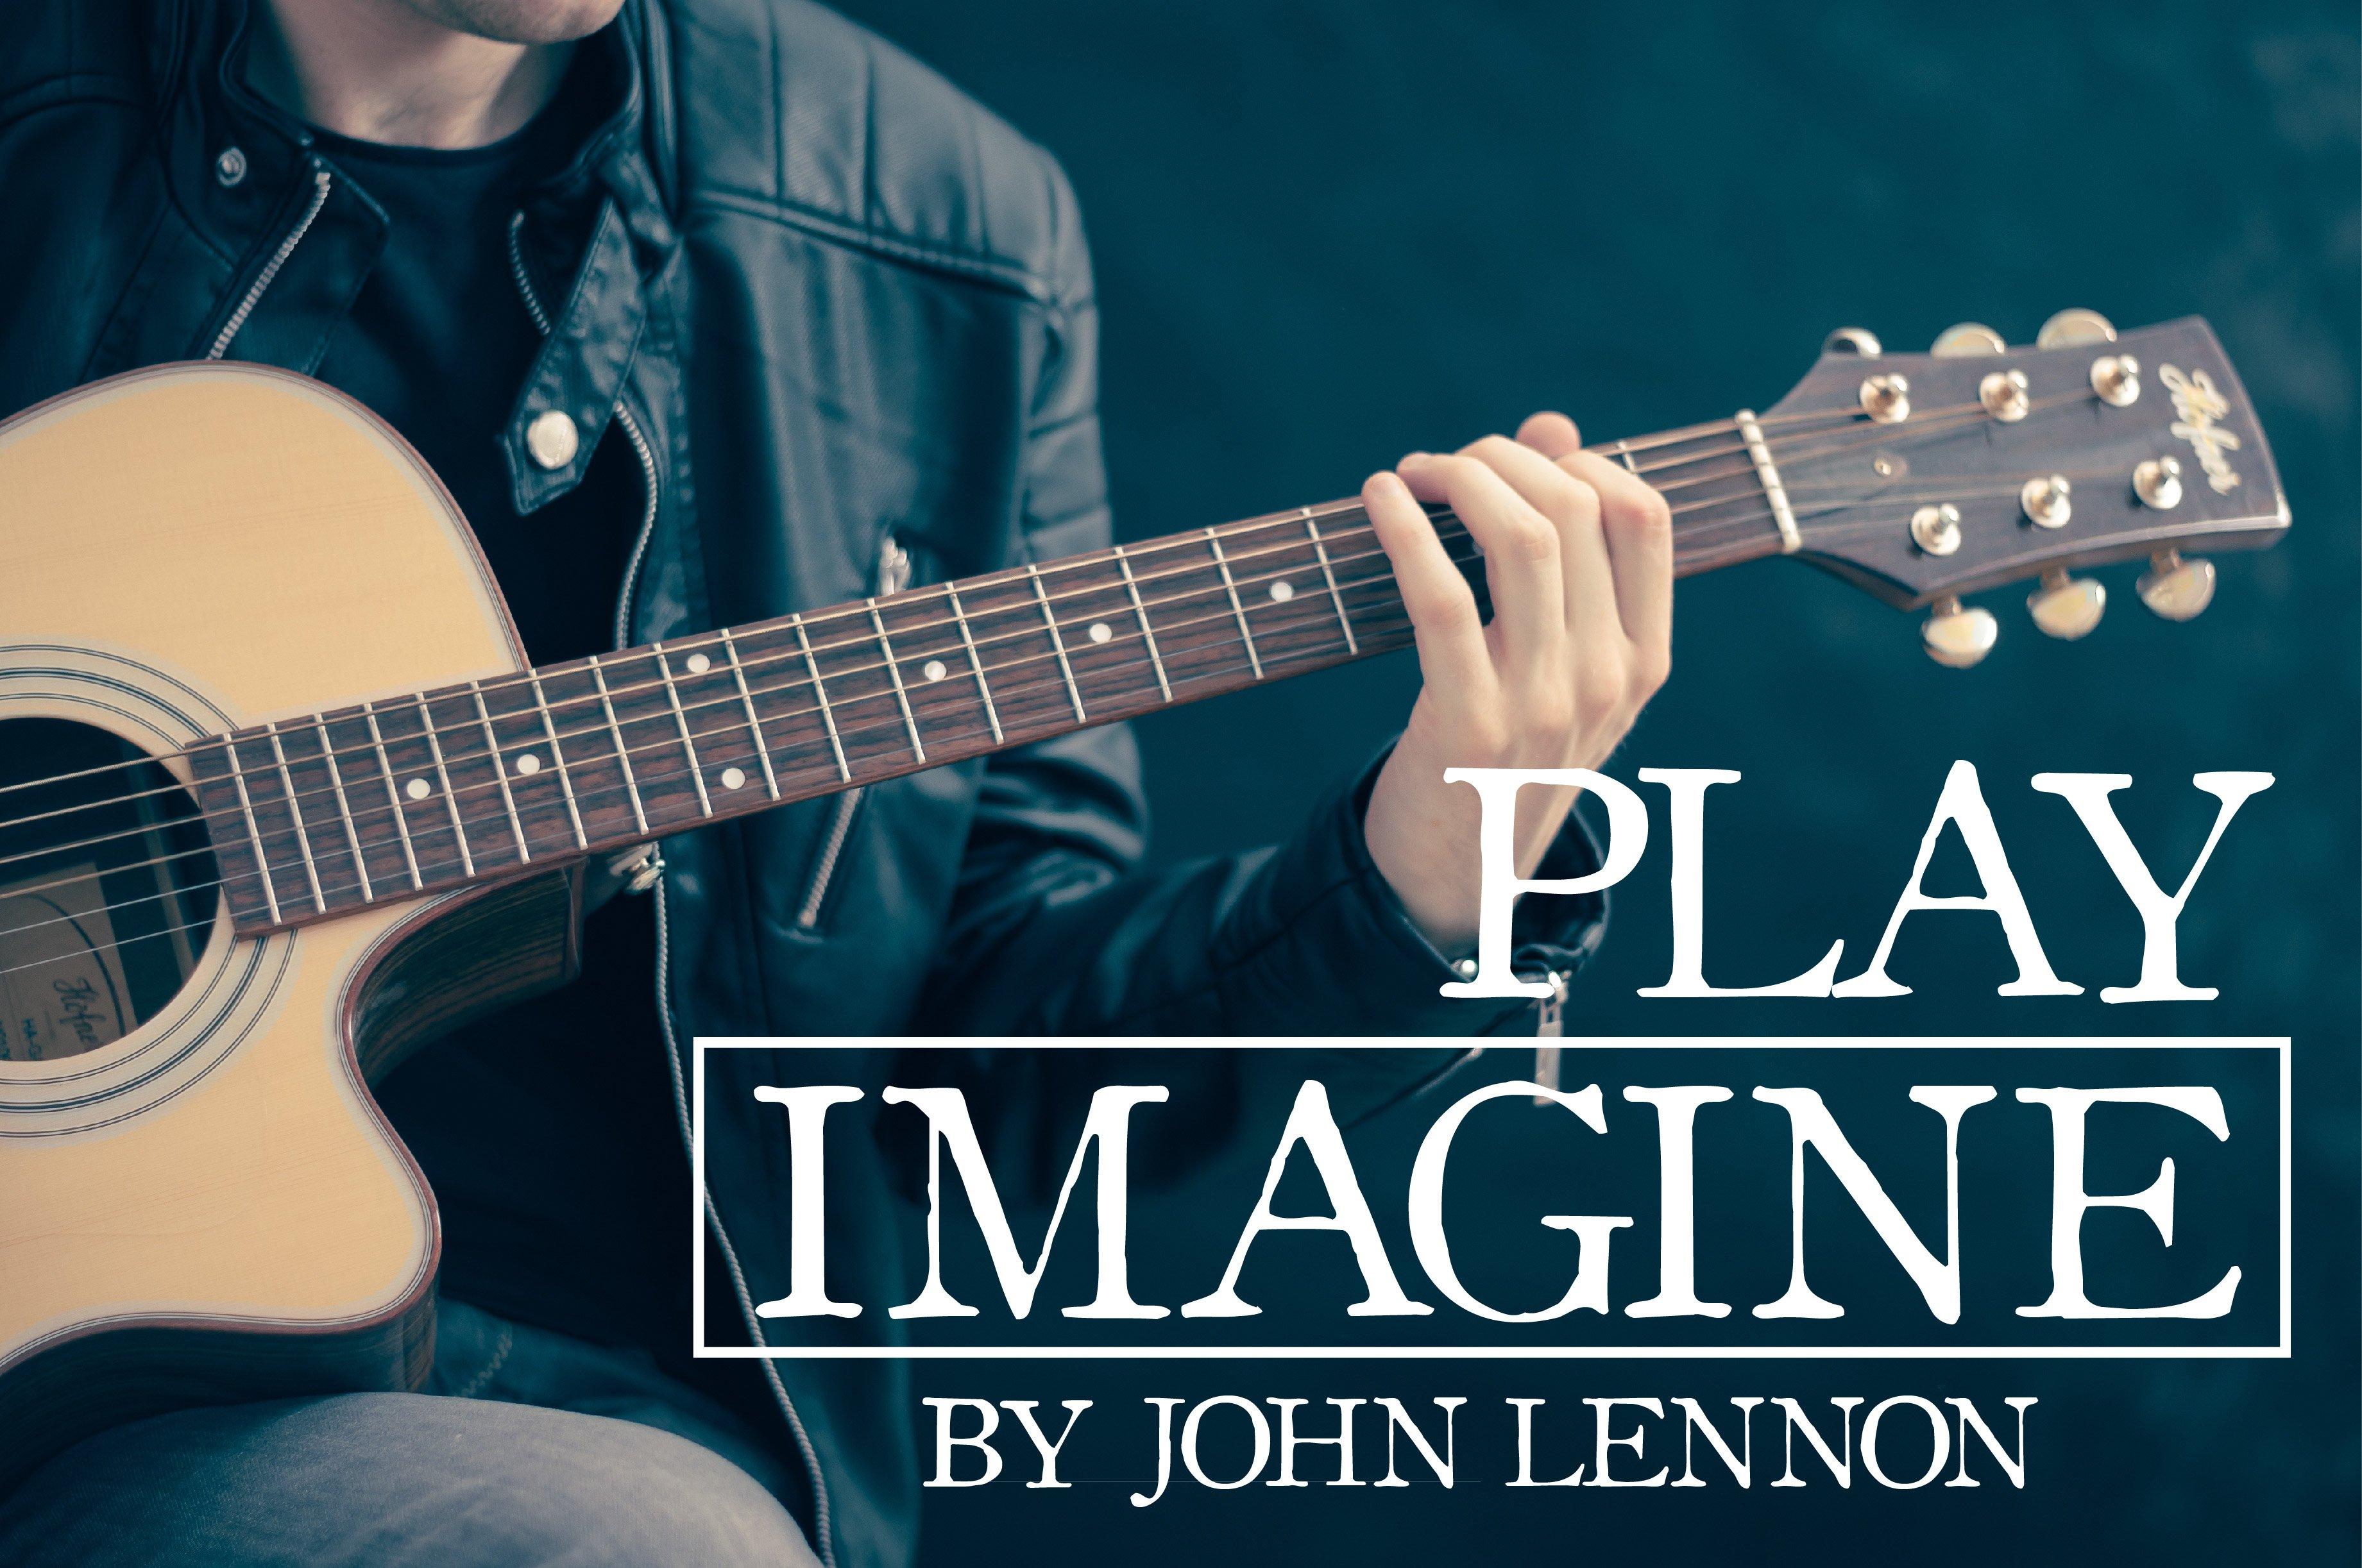 Play Imagine By John Lennon Like A Pro On The Guitar Renan